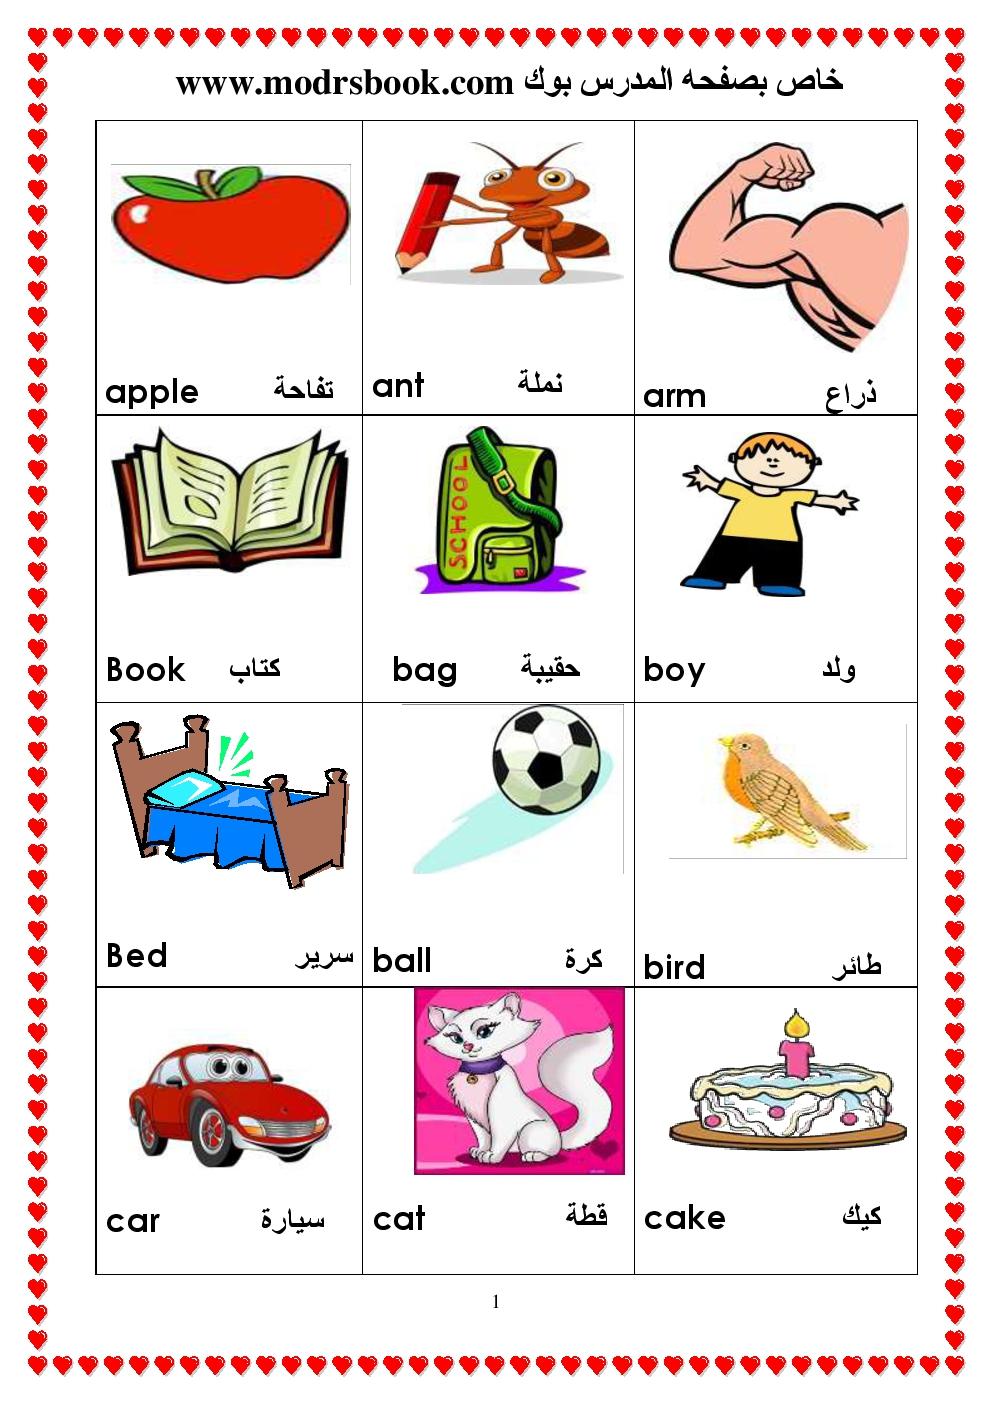 تحميل قاموس المعاني انجليزي عربي pdf